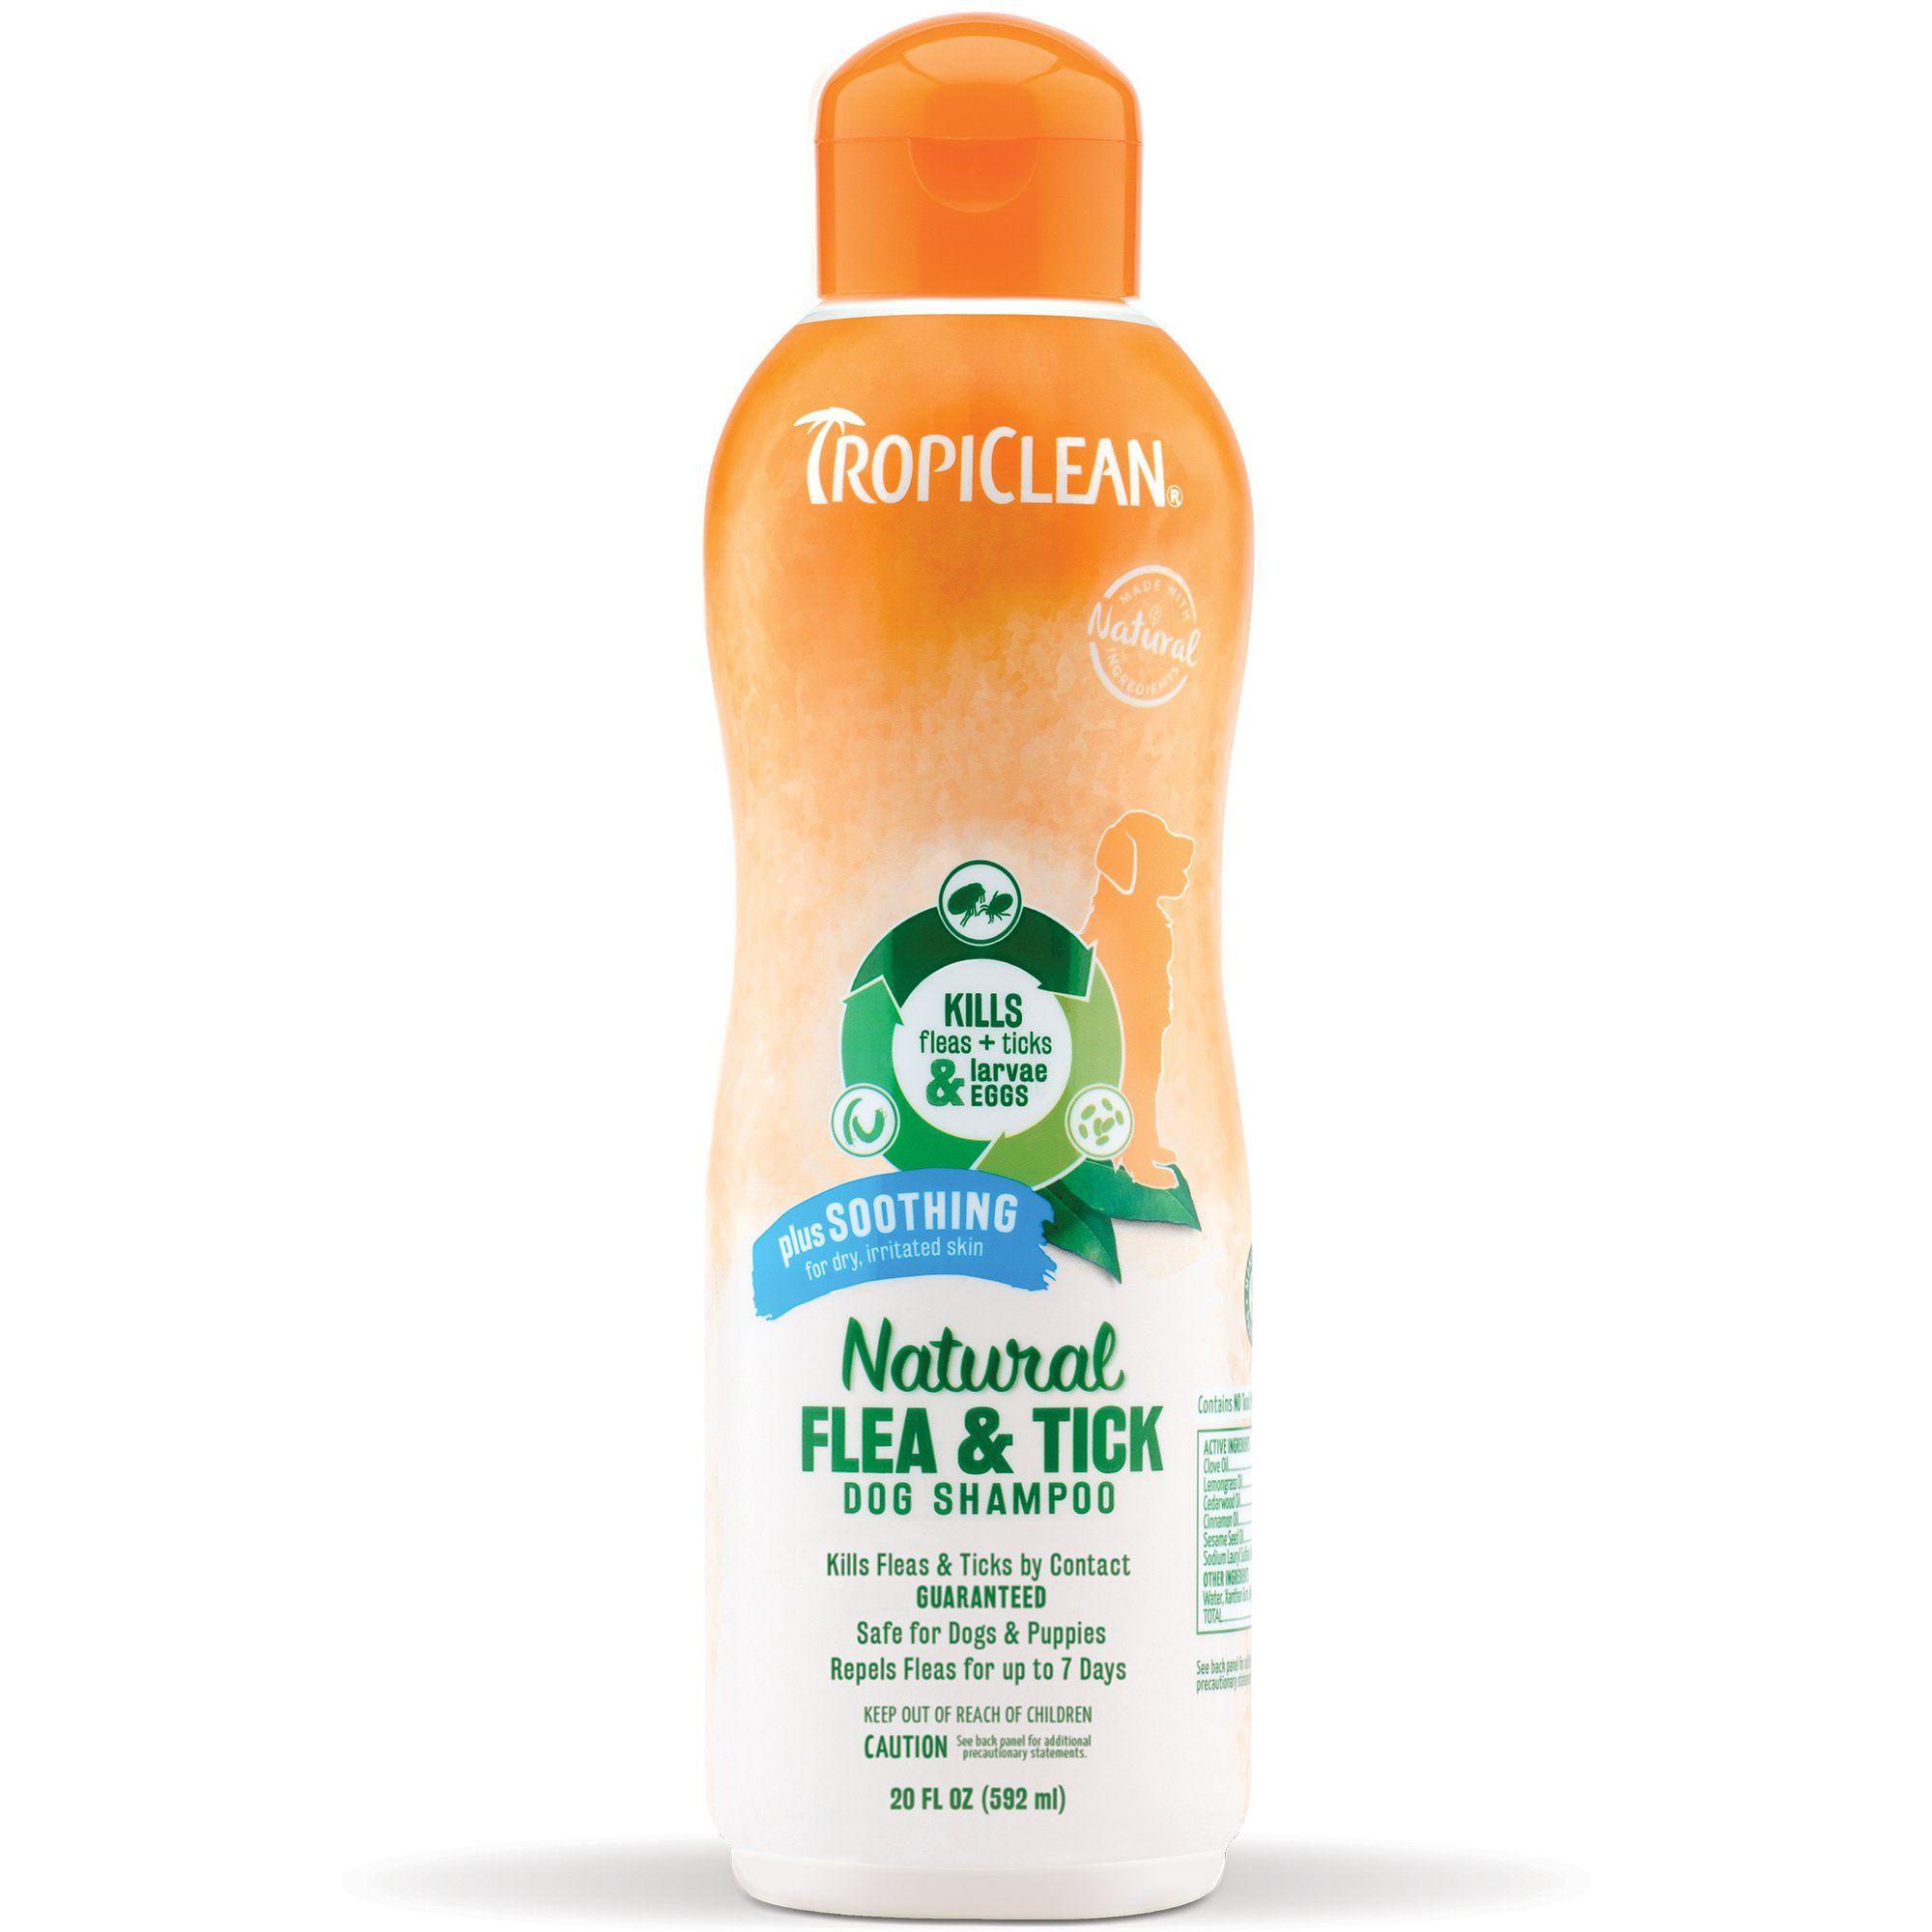 Tropiclean Natural Flea & Tick Soothing Shampoo, 20 fl. oz